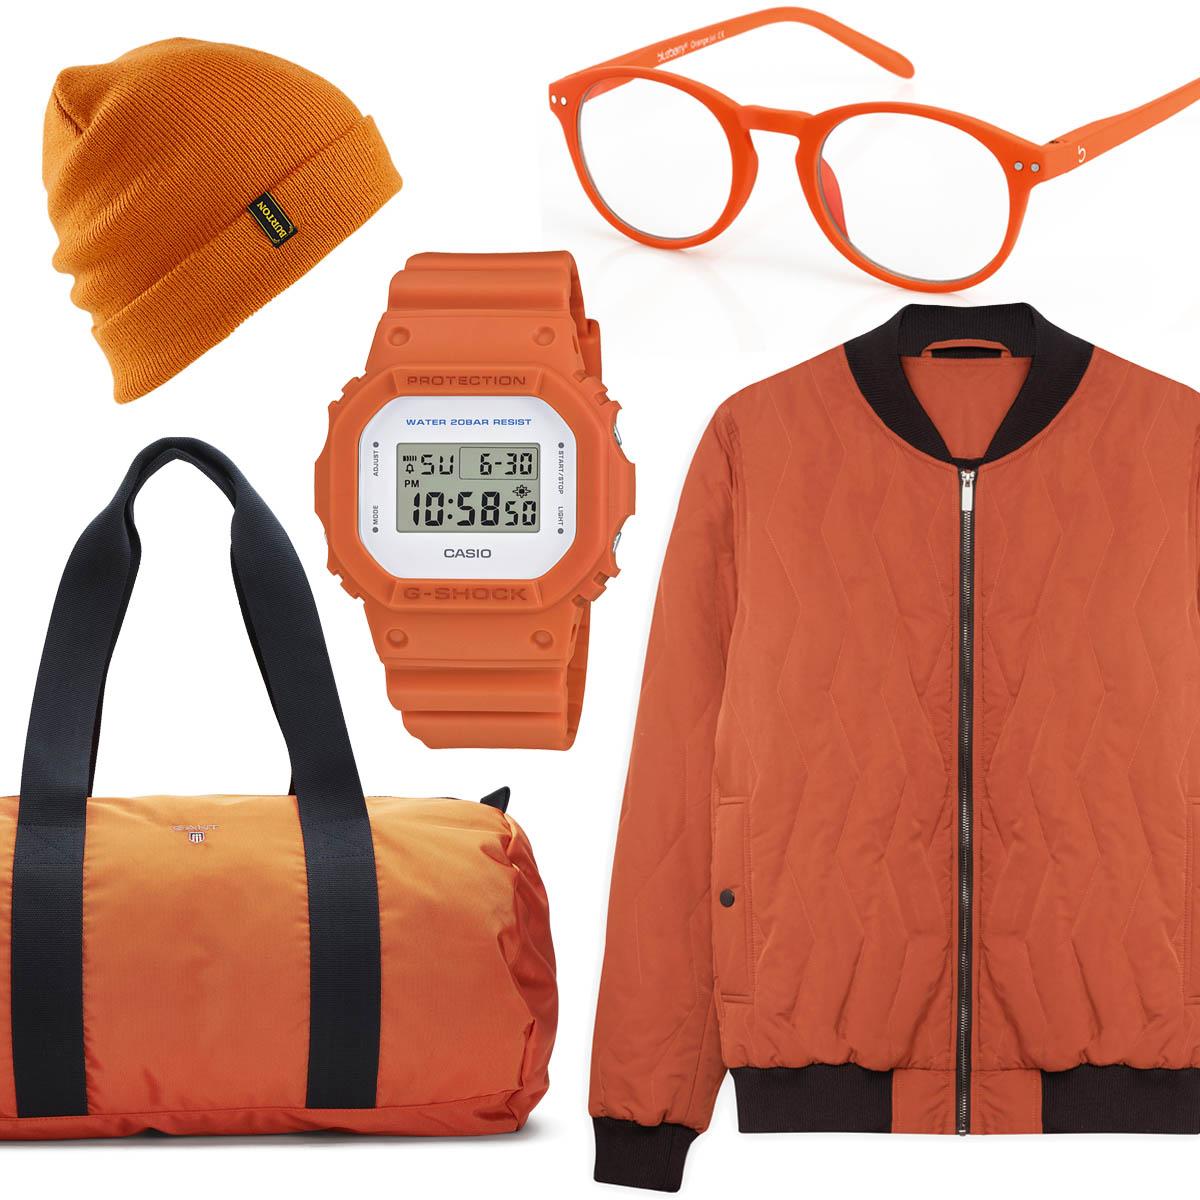 tetu-mode-orange-primark-casio-burton